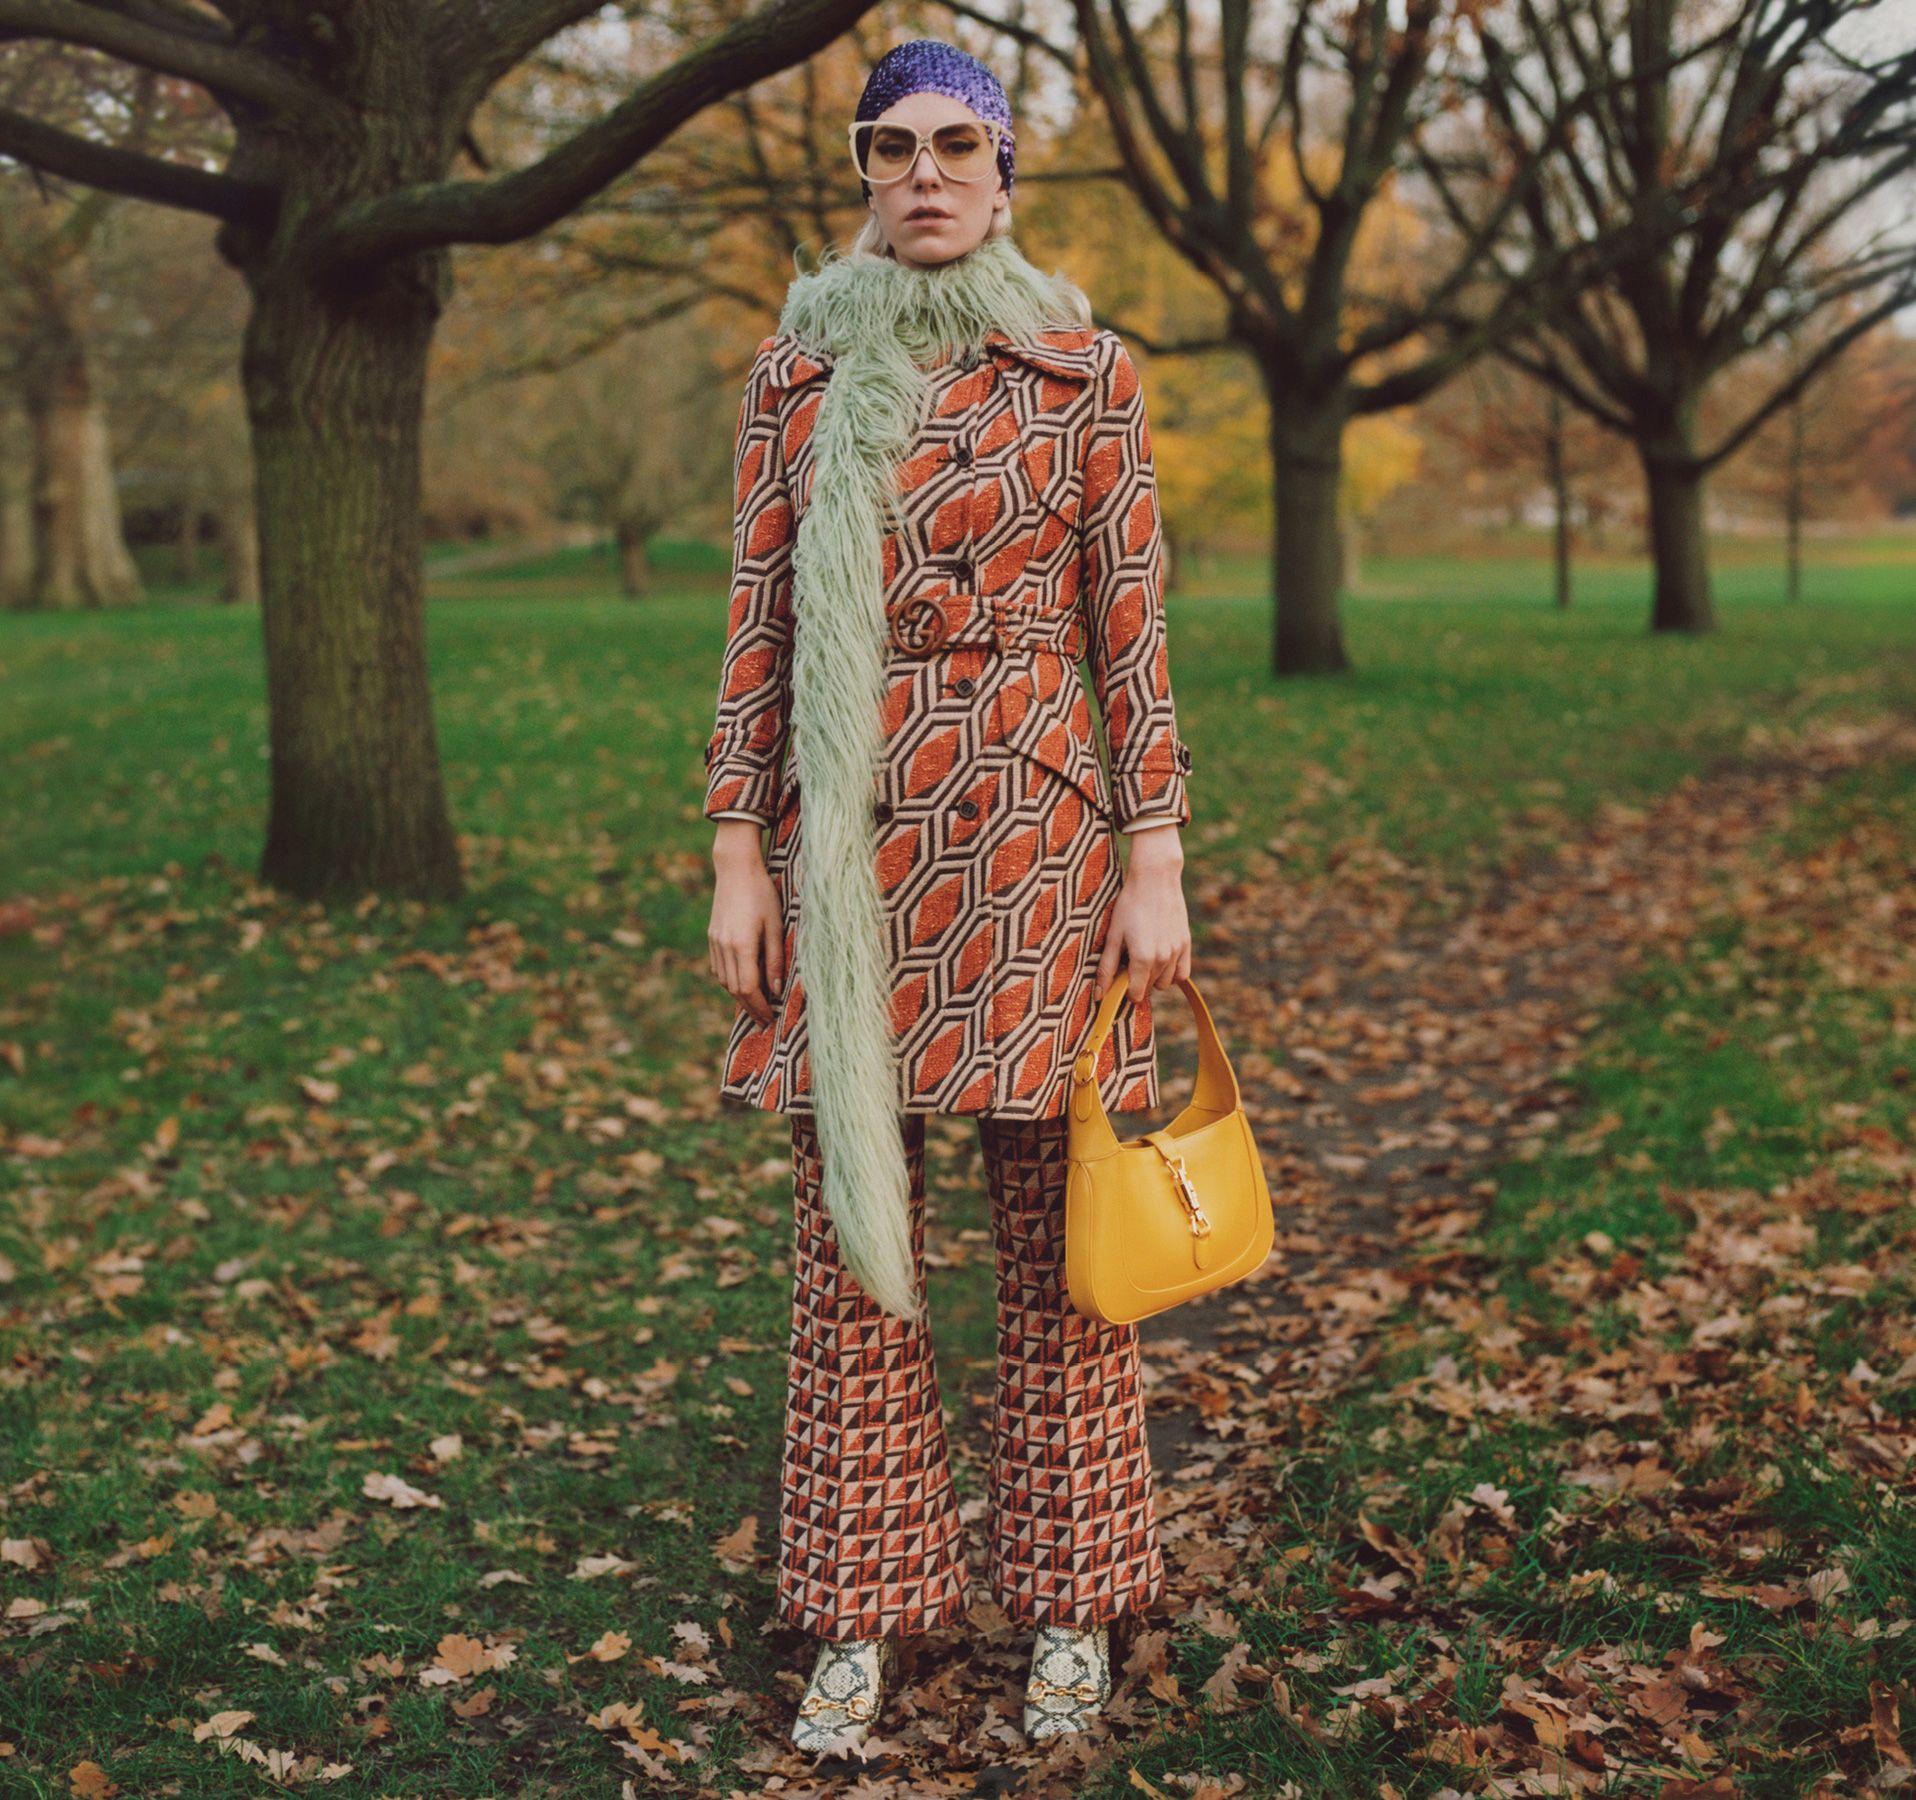 Gucci 'Winter In The Park' Spring 2021 Ad Campaign